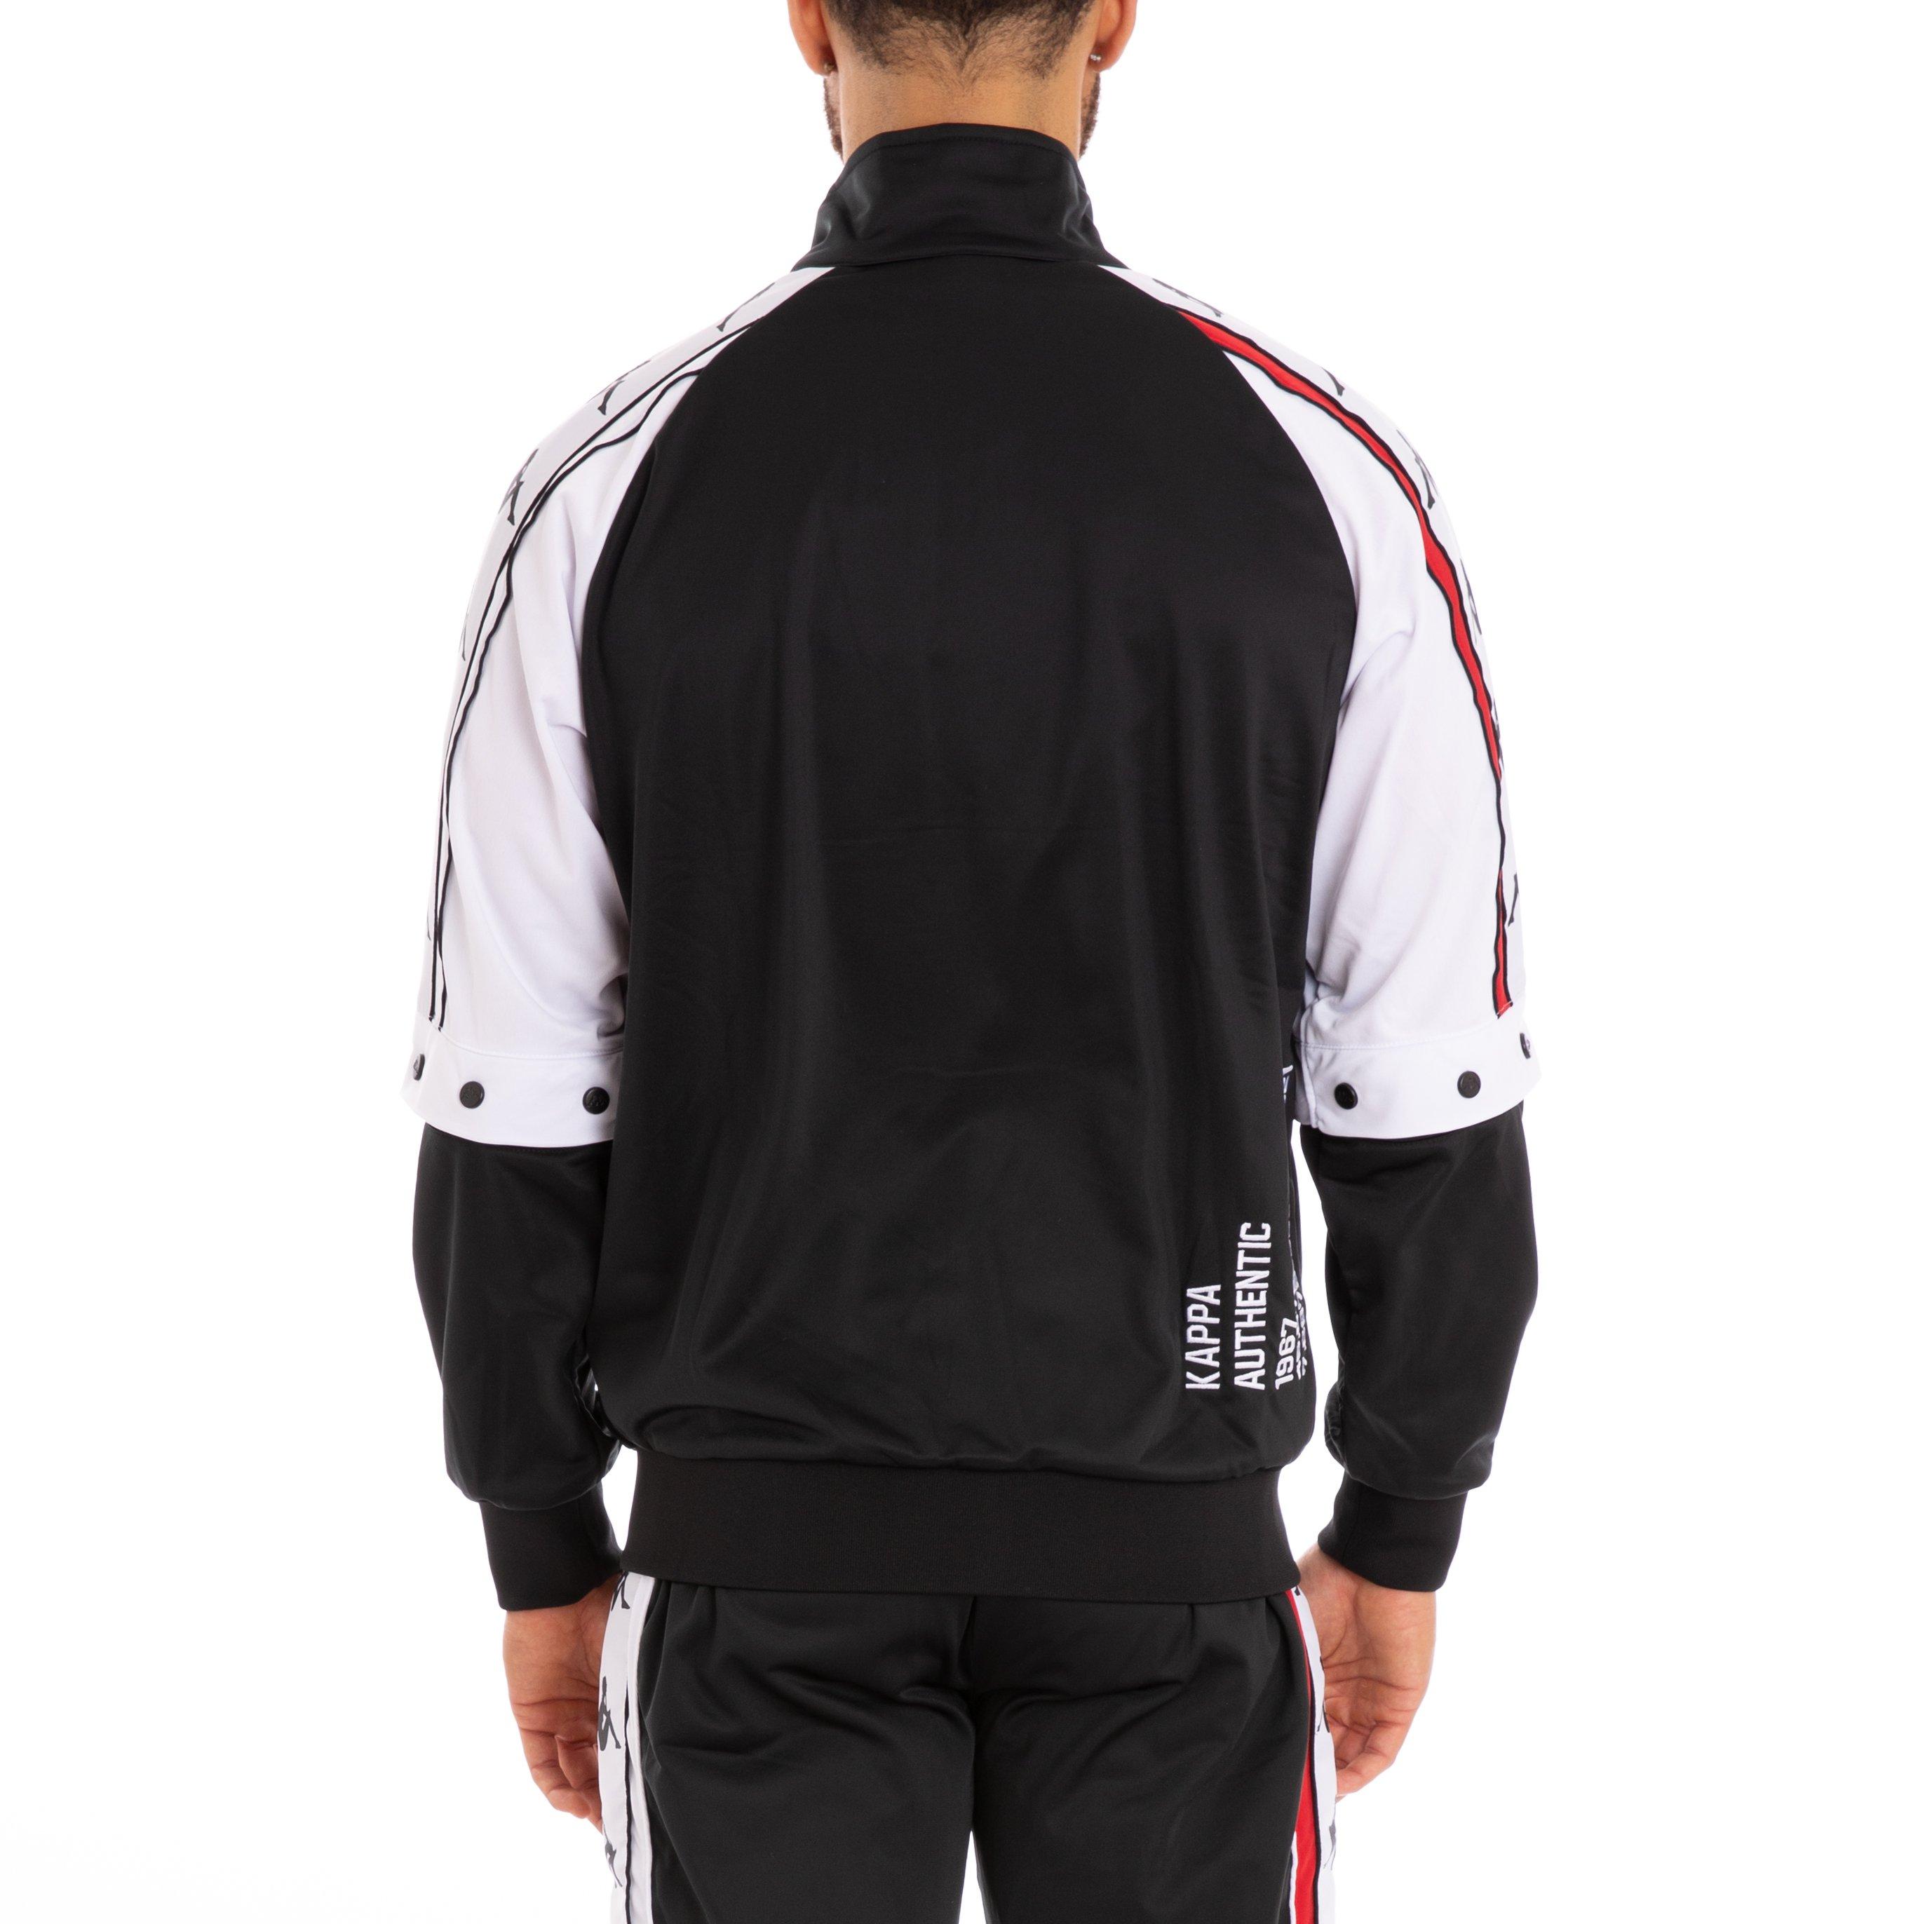 c575e9050 Kappa - Authentic Bafer Zip up - Black/ White-Red